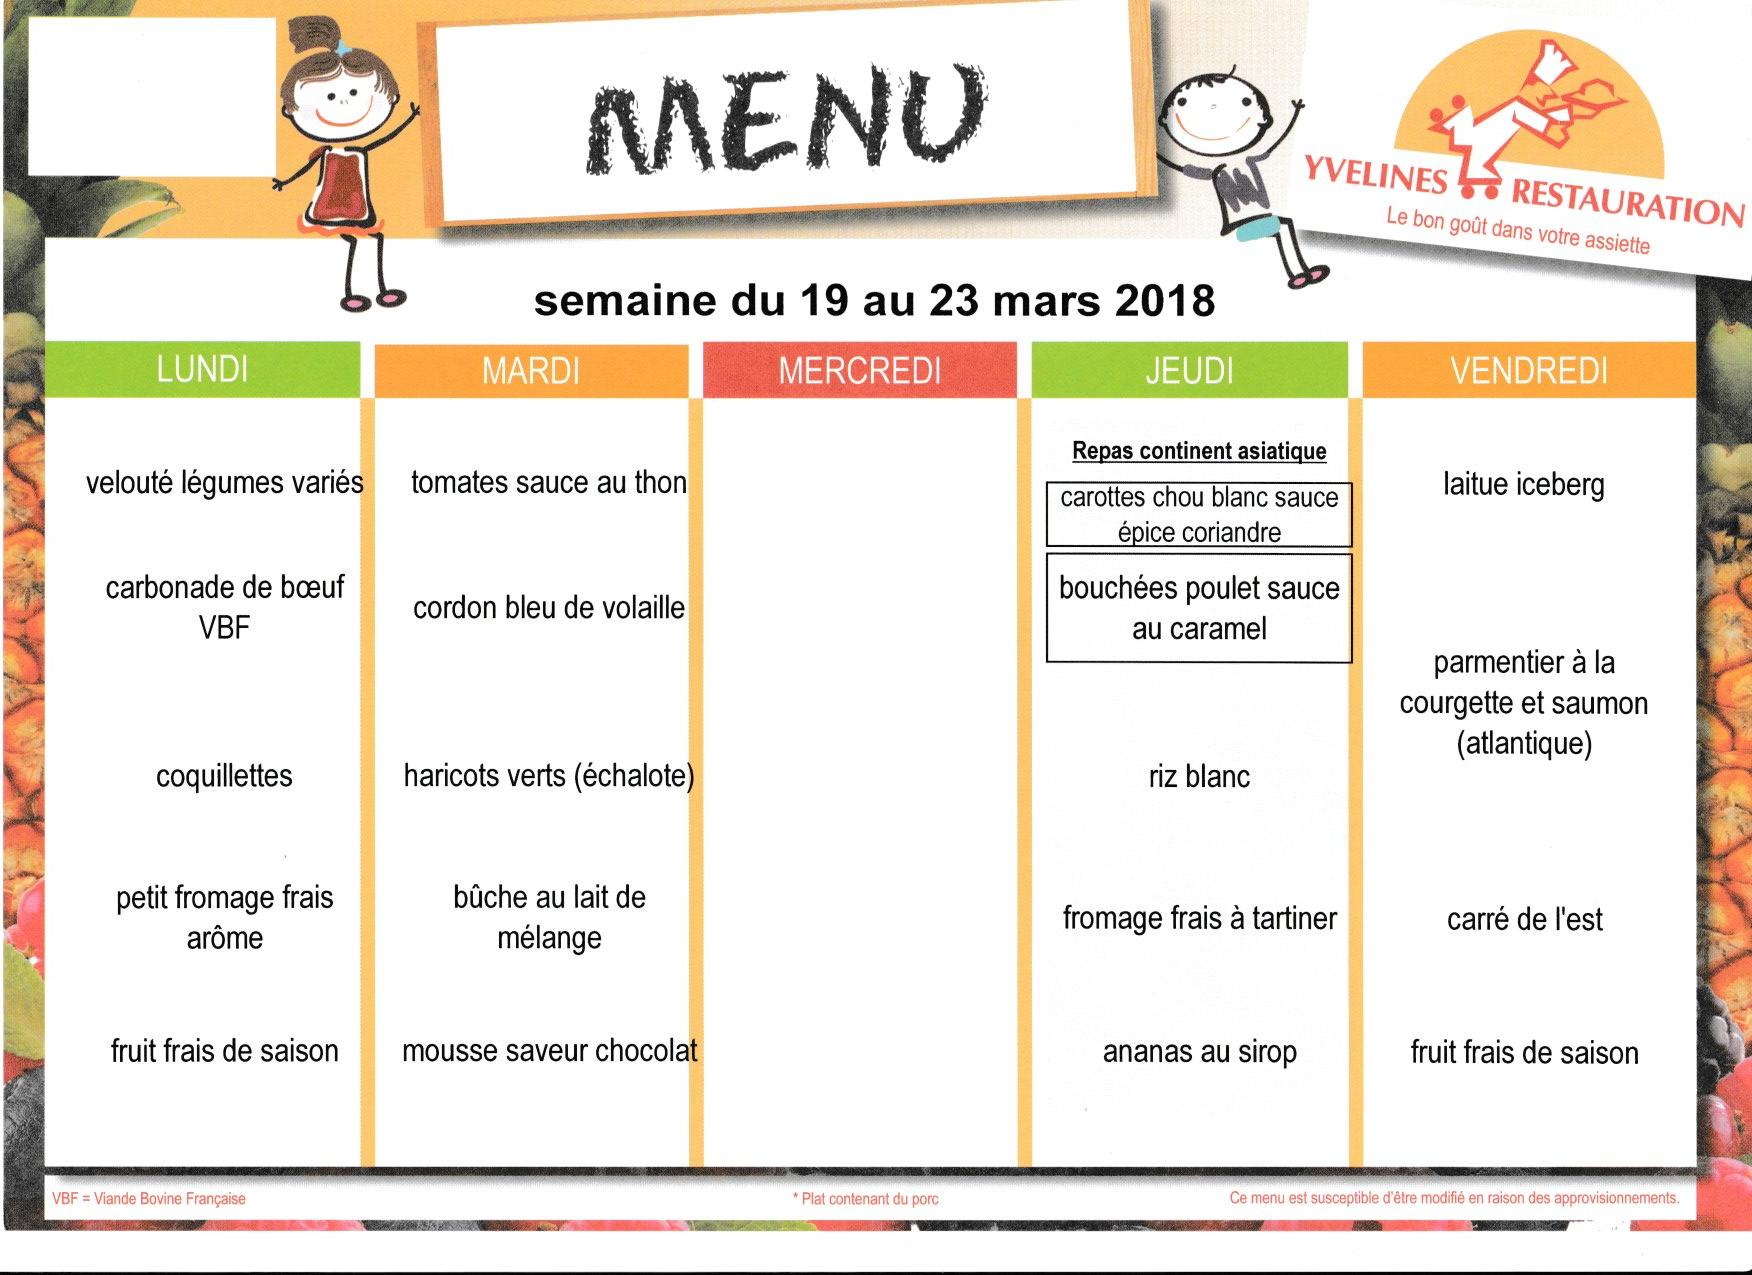 menu du 19 au 23 mars